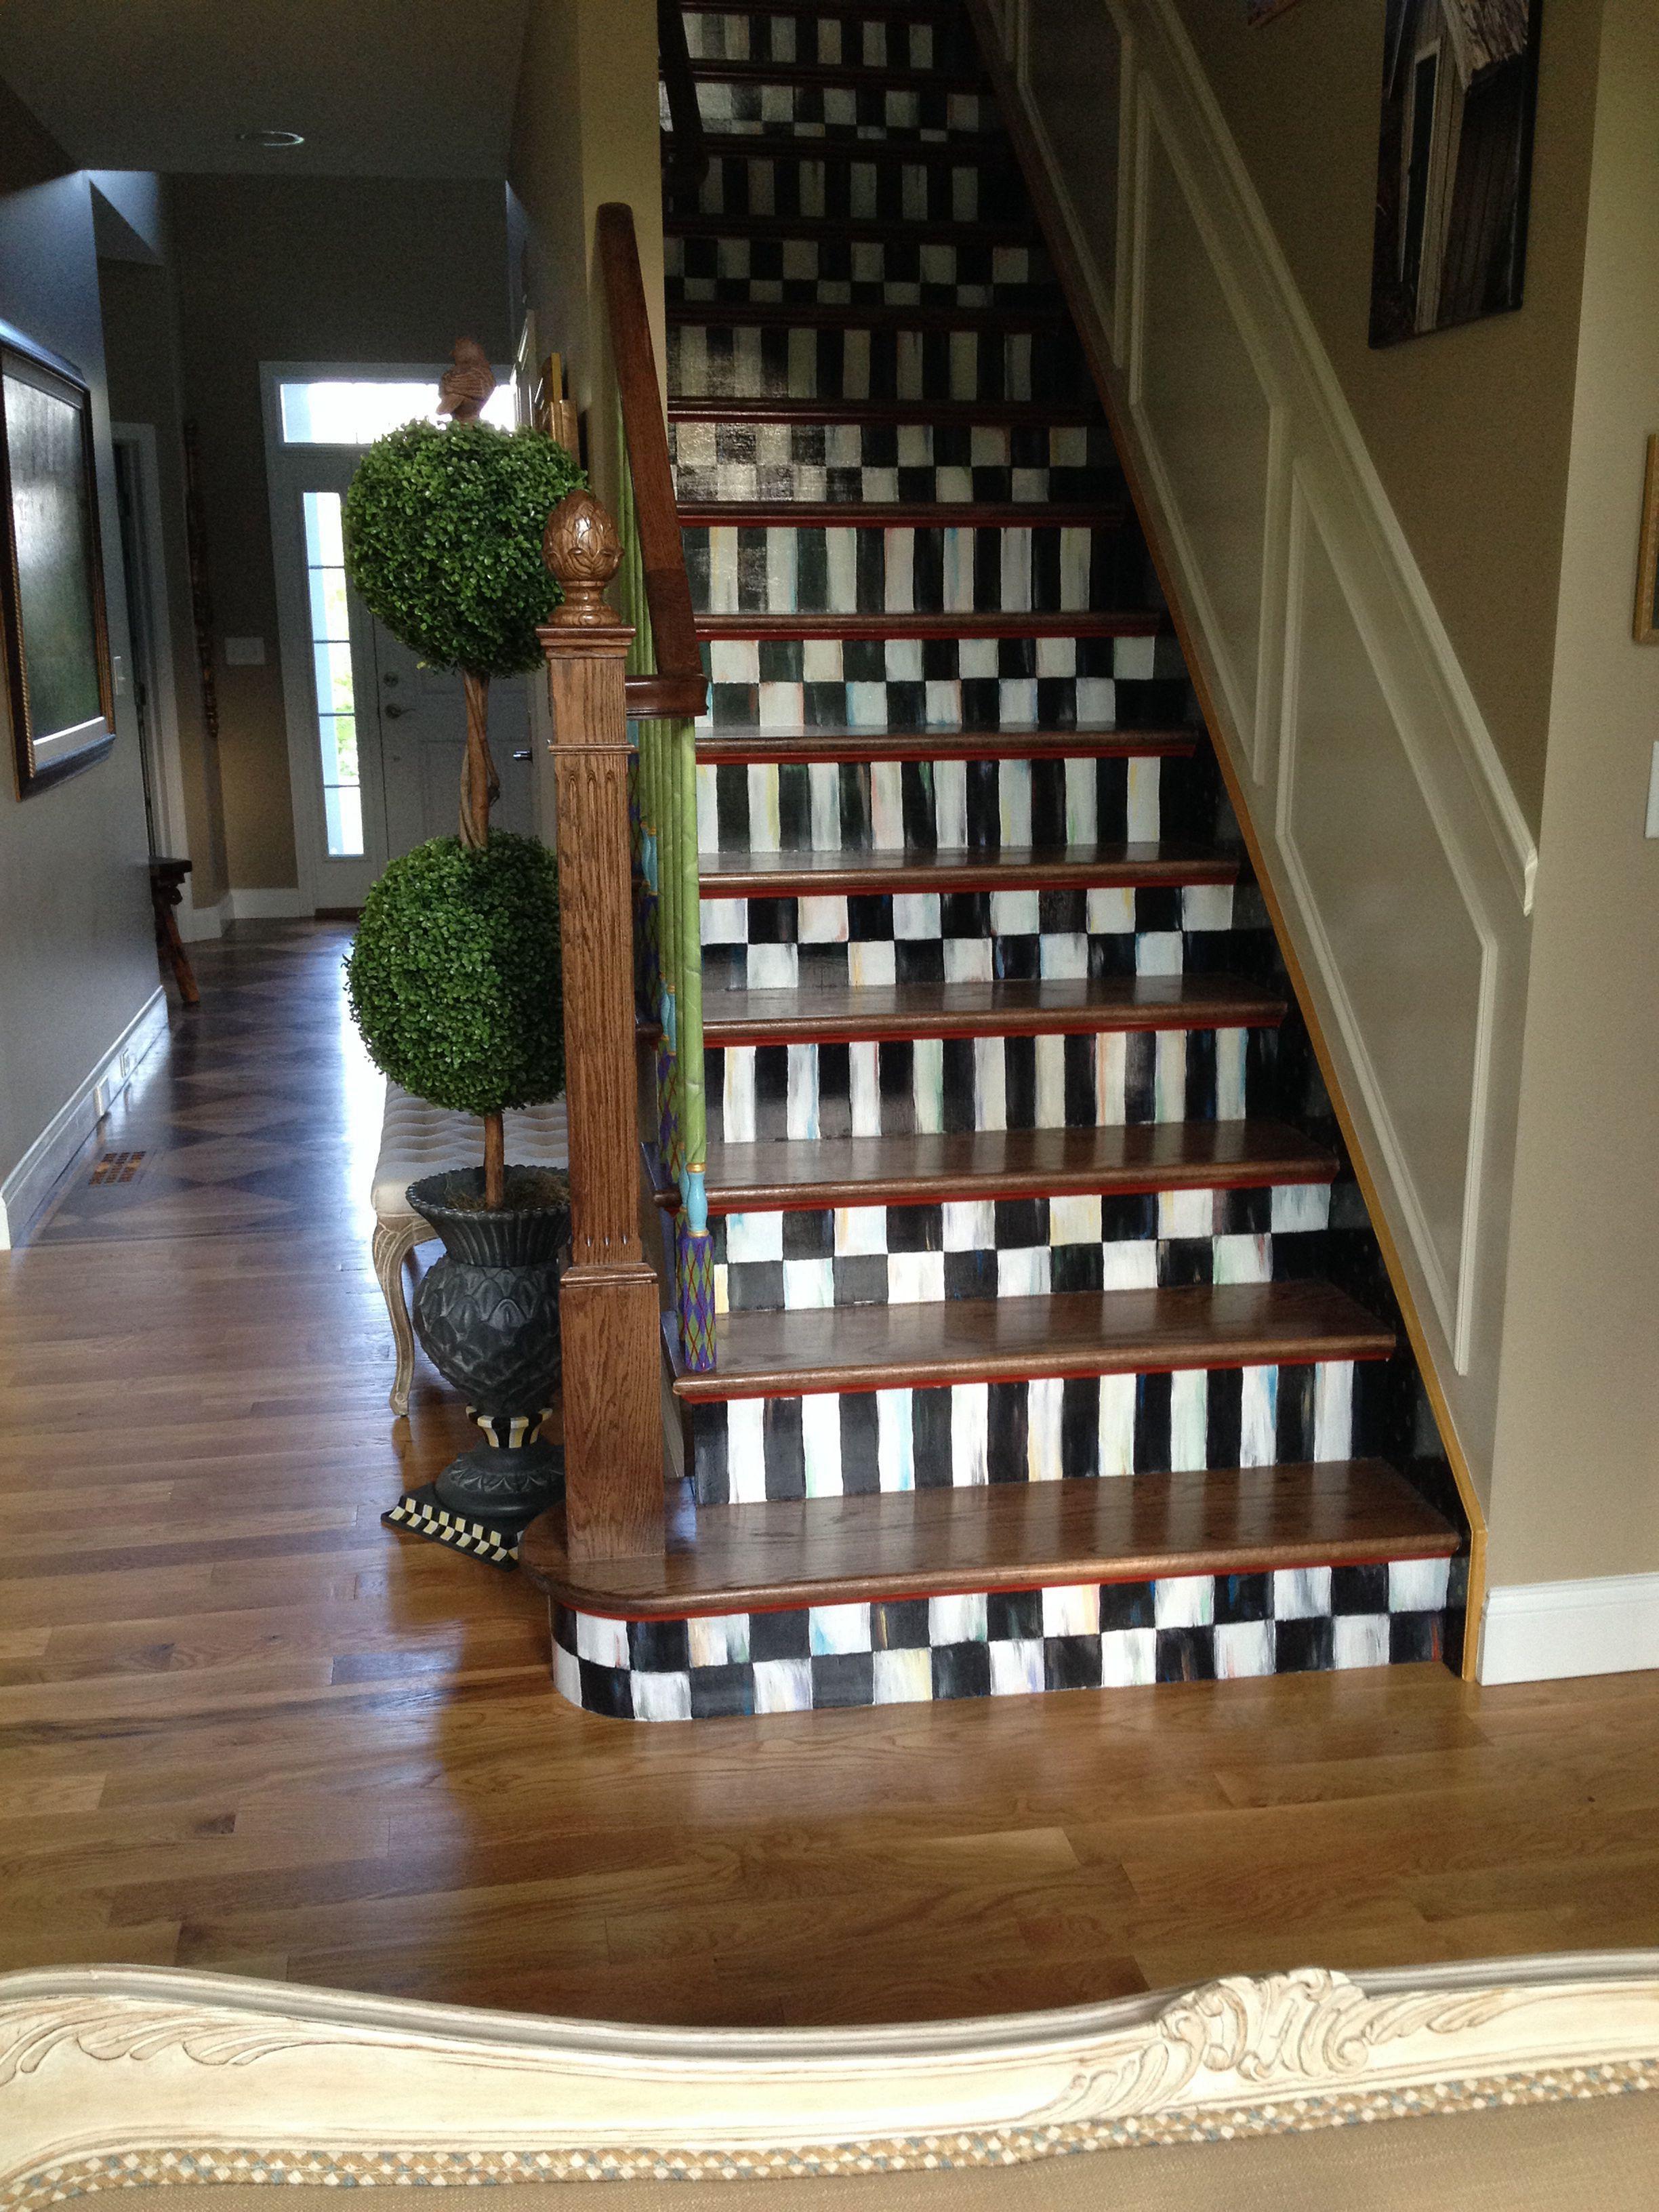 Most Popular Ideas Mackenzie Childs For Home Interior Design